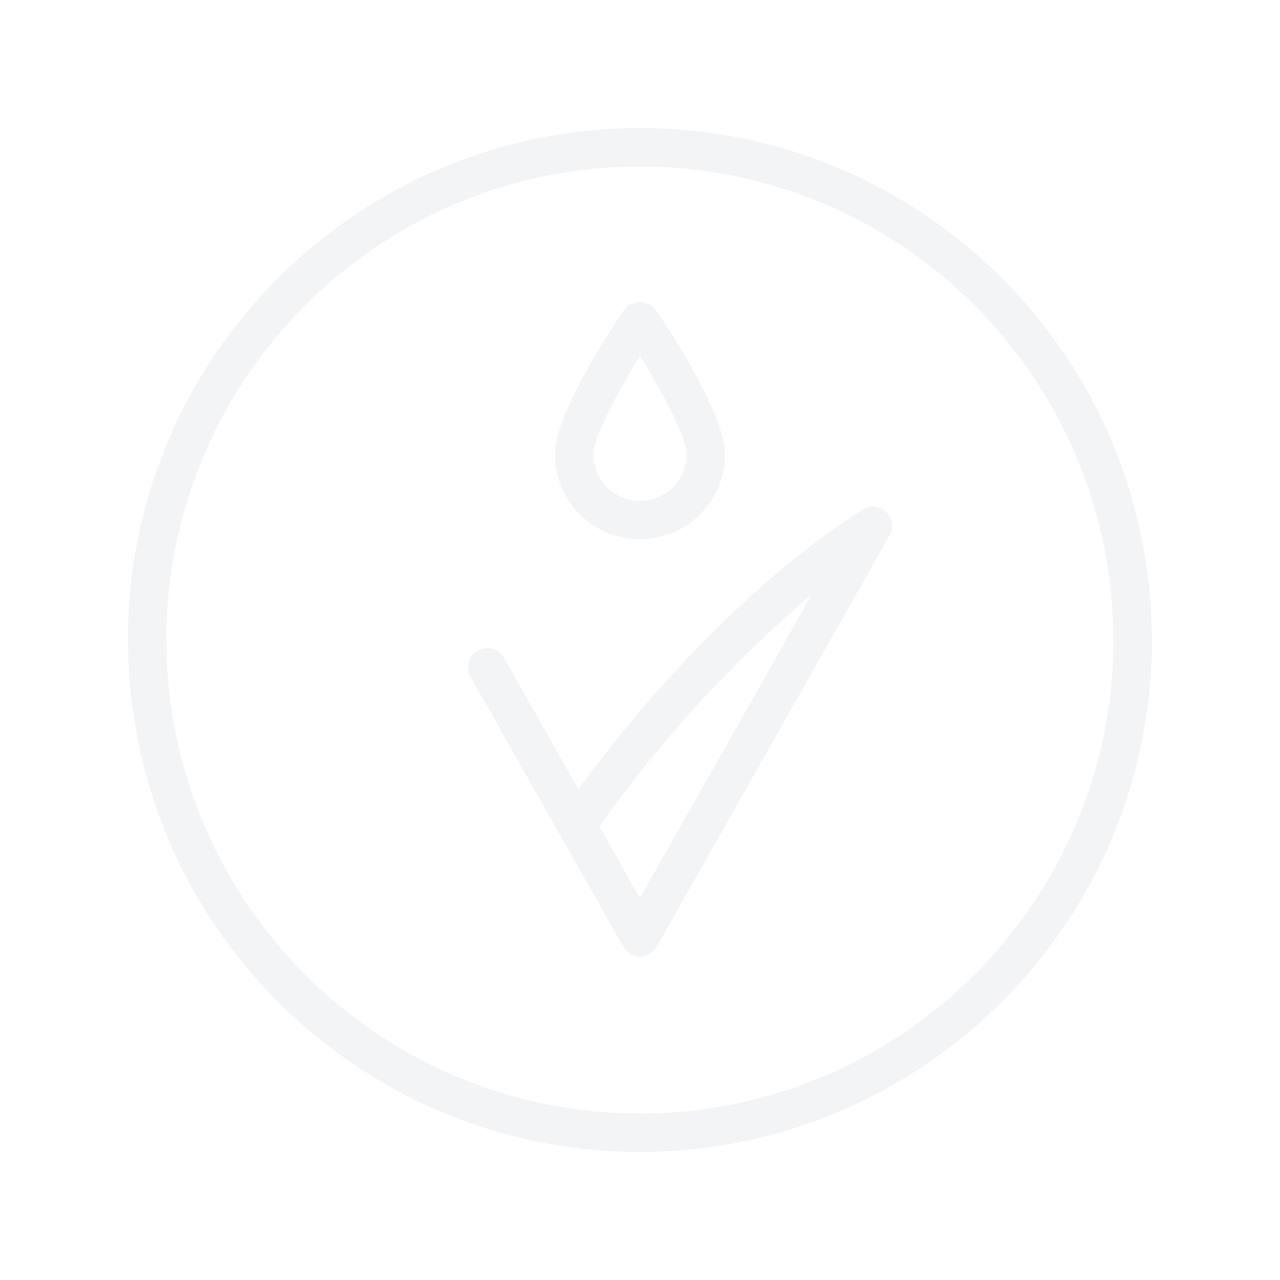 MARLIES MÖLLER Pashmisilk Luxury Silky крем-маска для волос 125ml